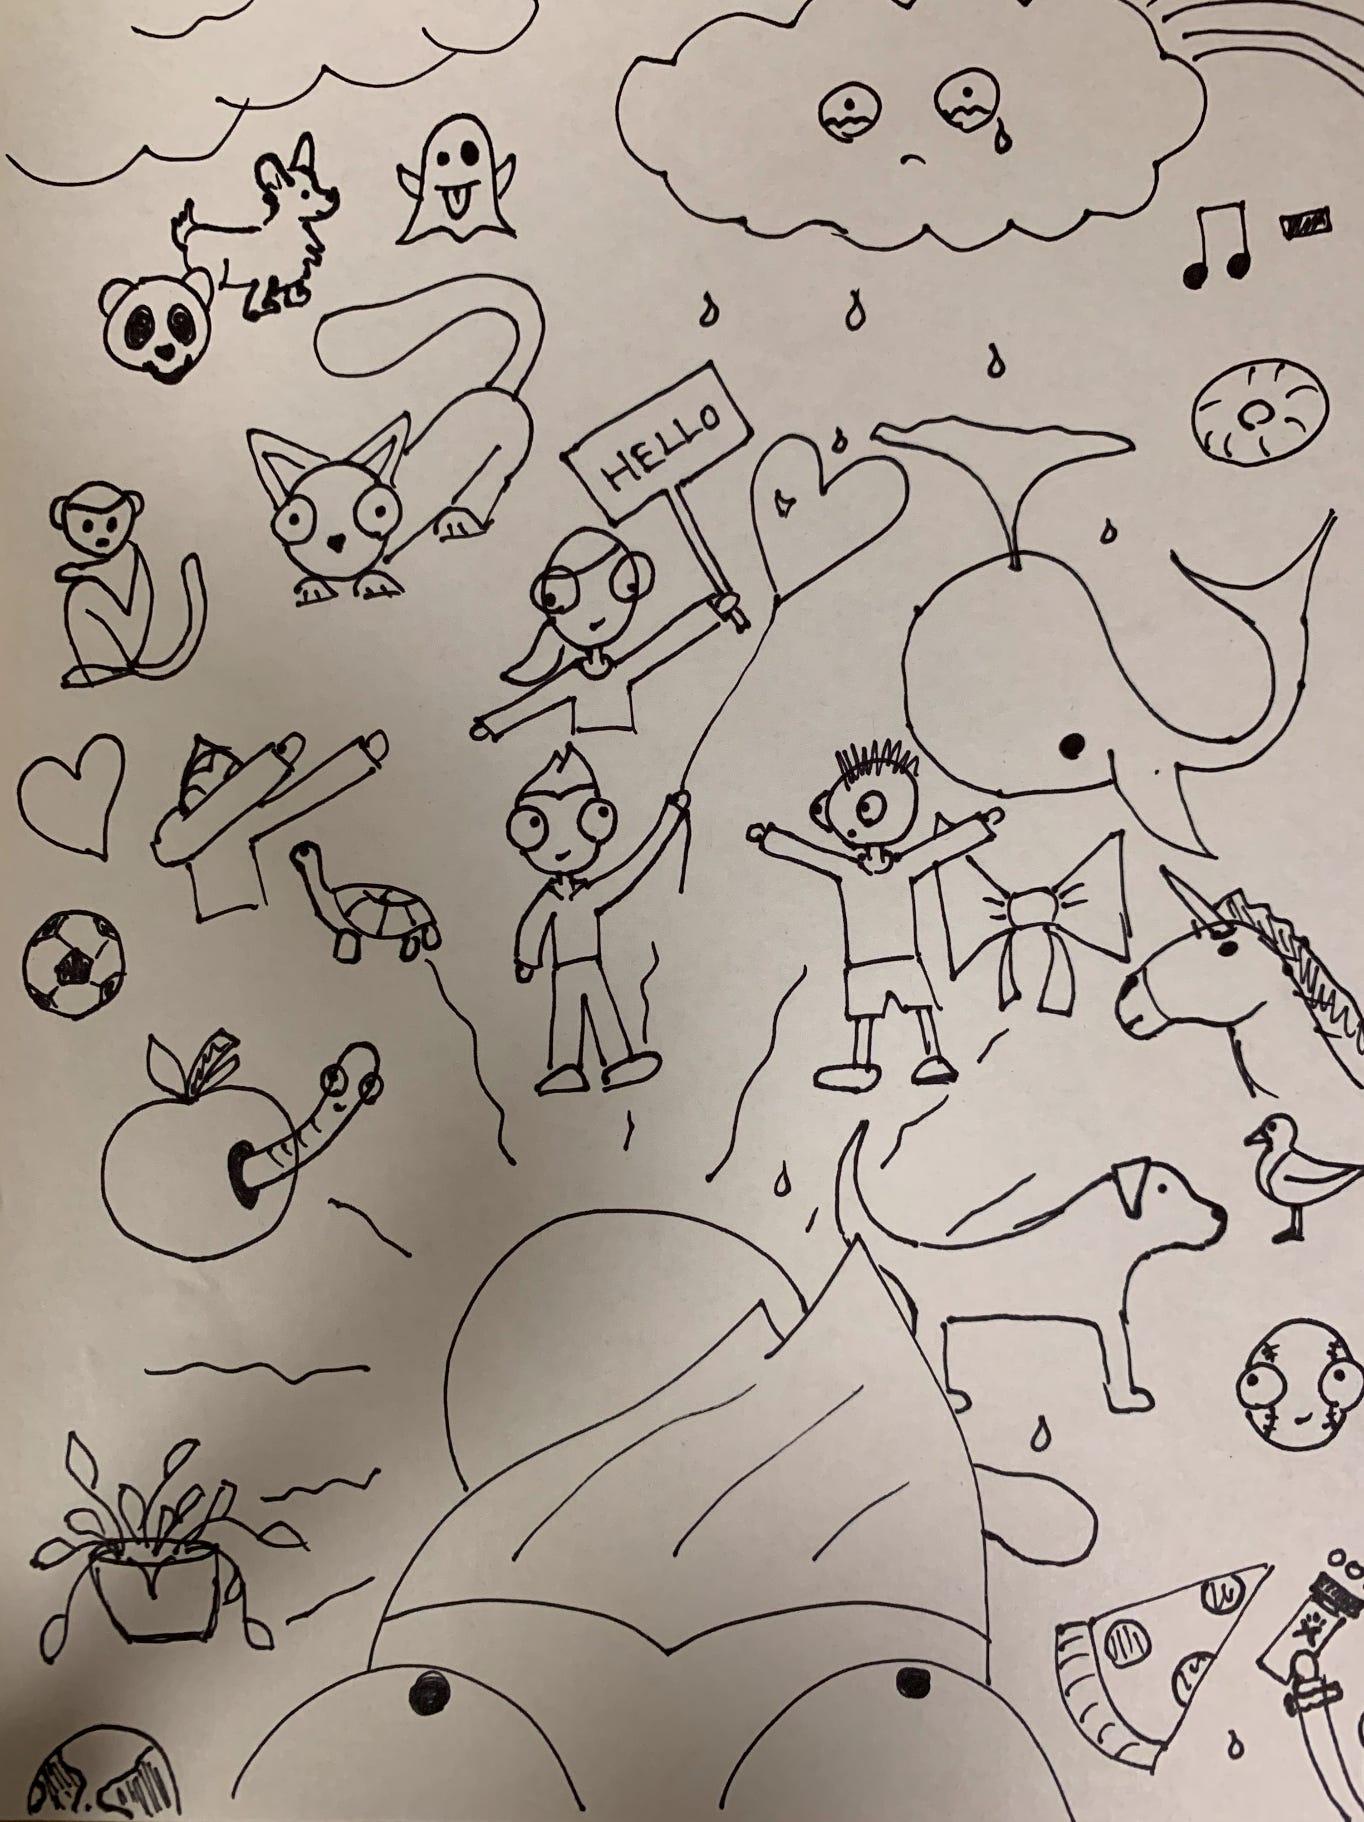 Tiktok Doodles - hot tiktok 2020   Doodle Art Tiktok Doodles